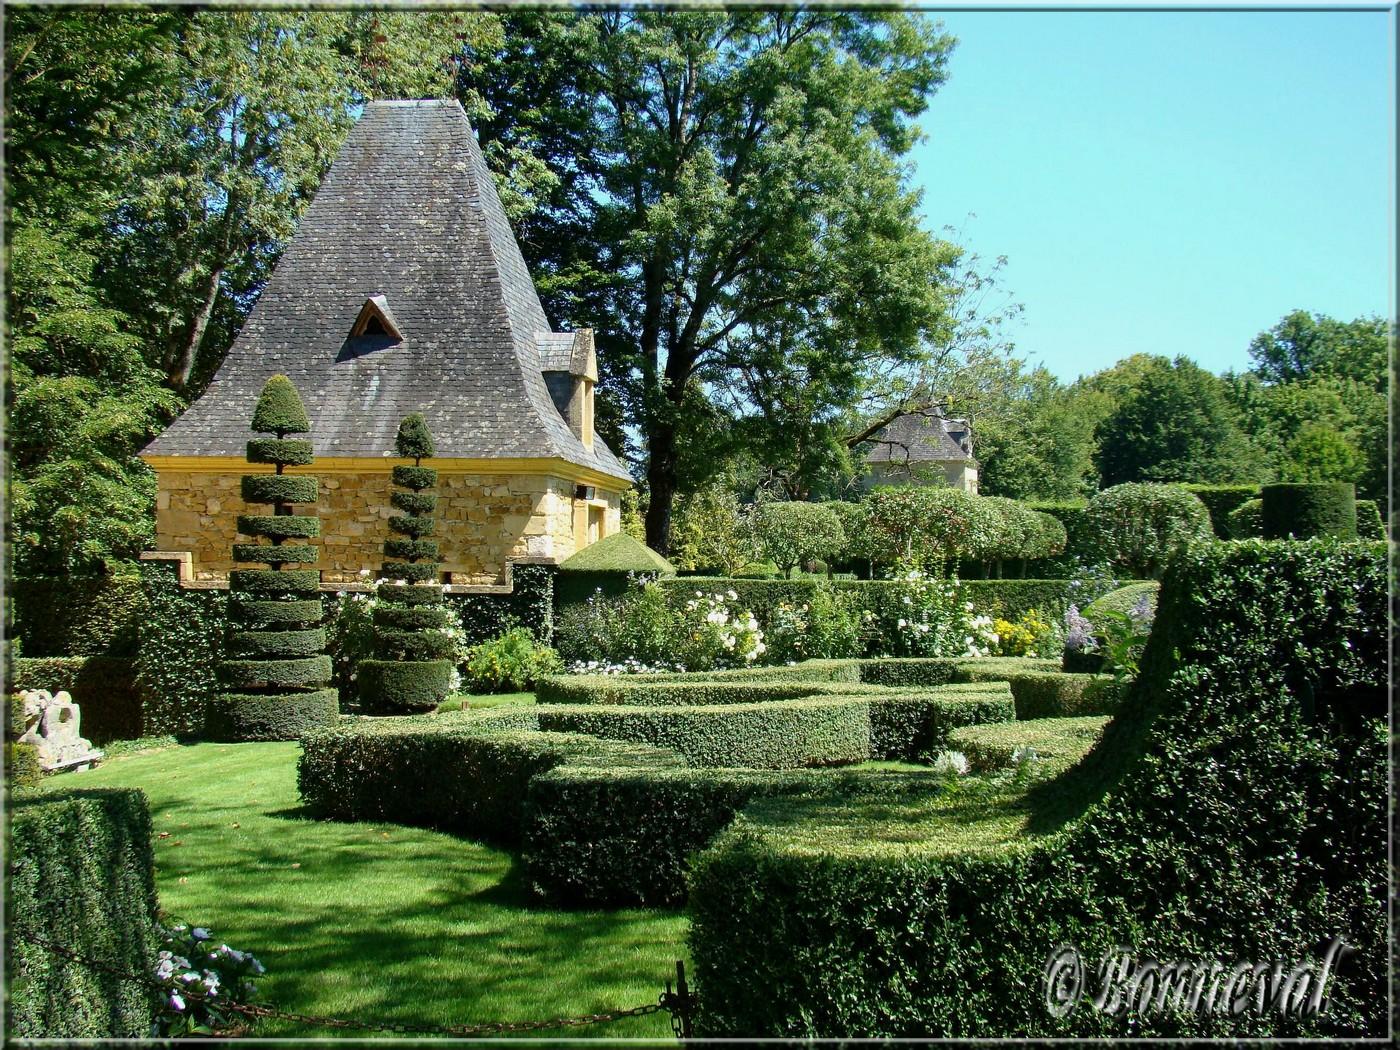 Jardins du manoir d 39 eyrignac escapades en france - Jardins du manoir d eyrignac ...